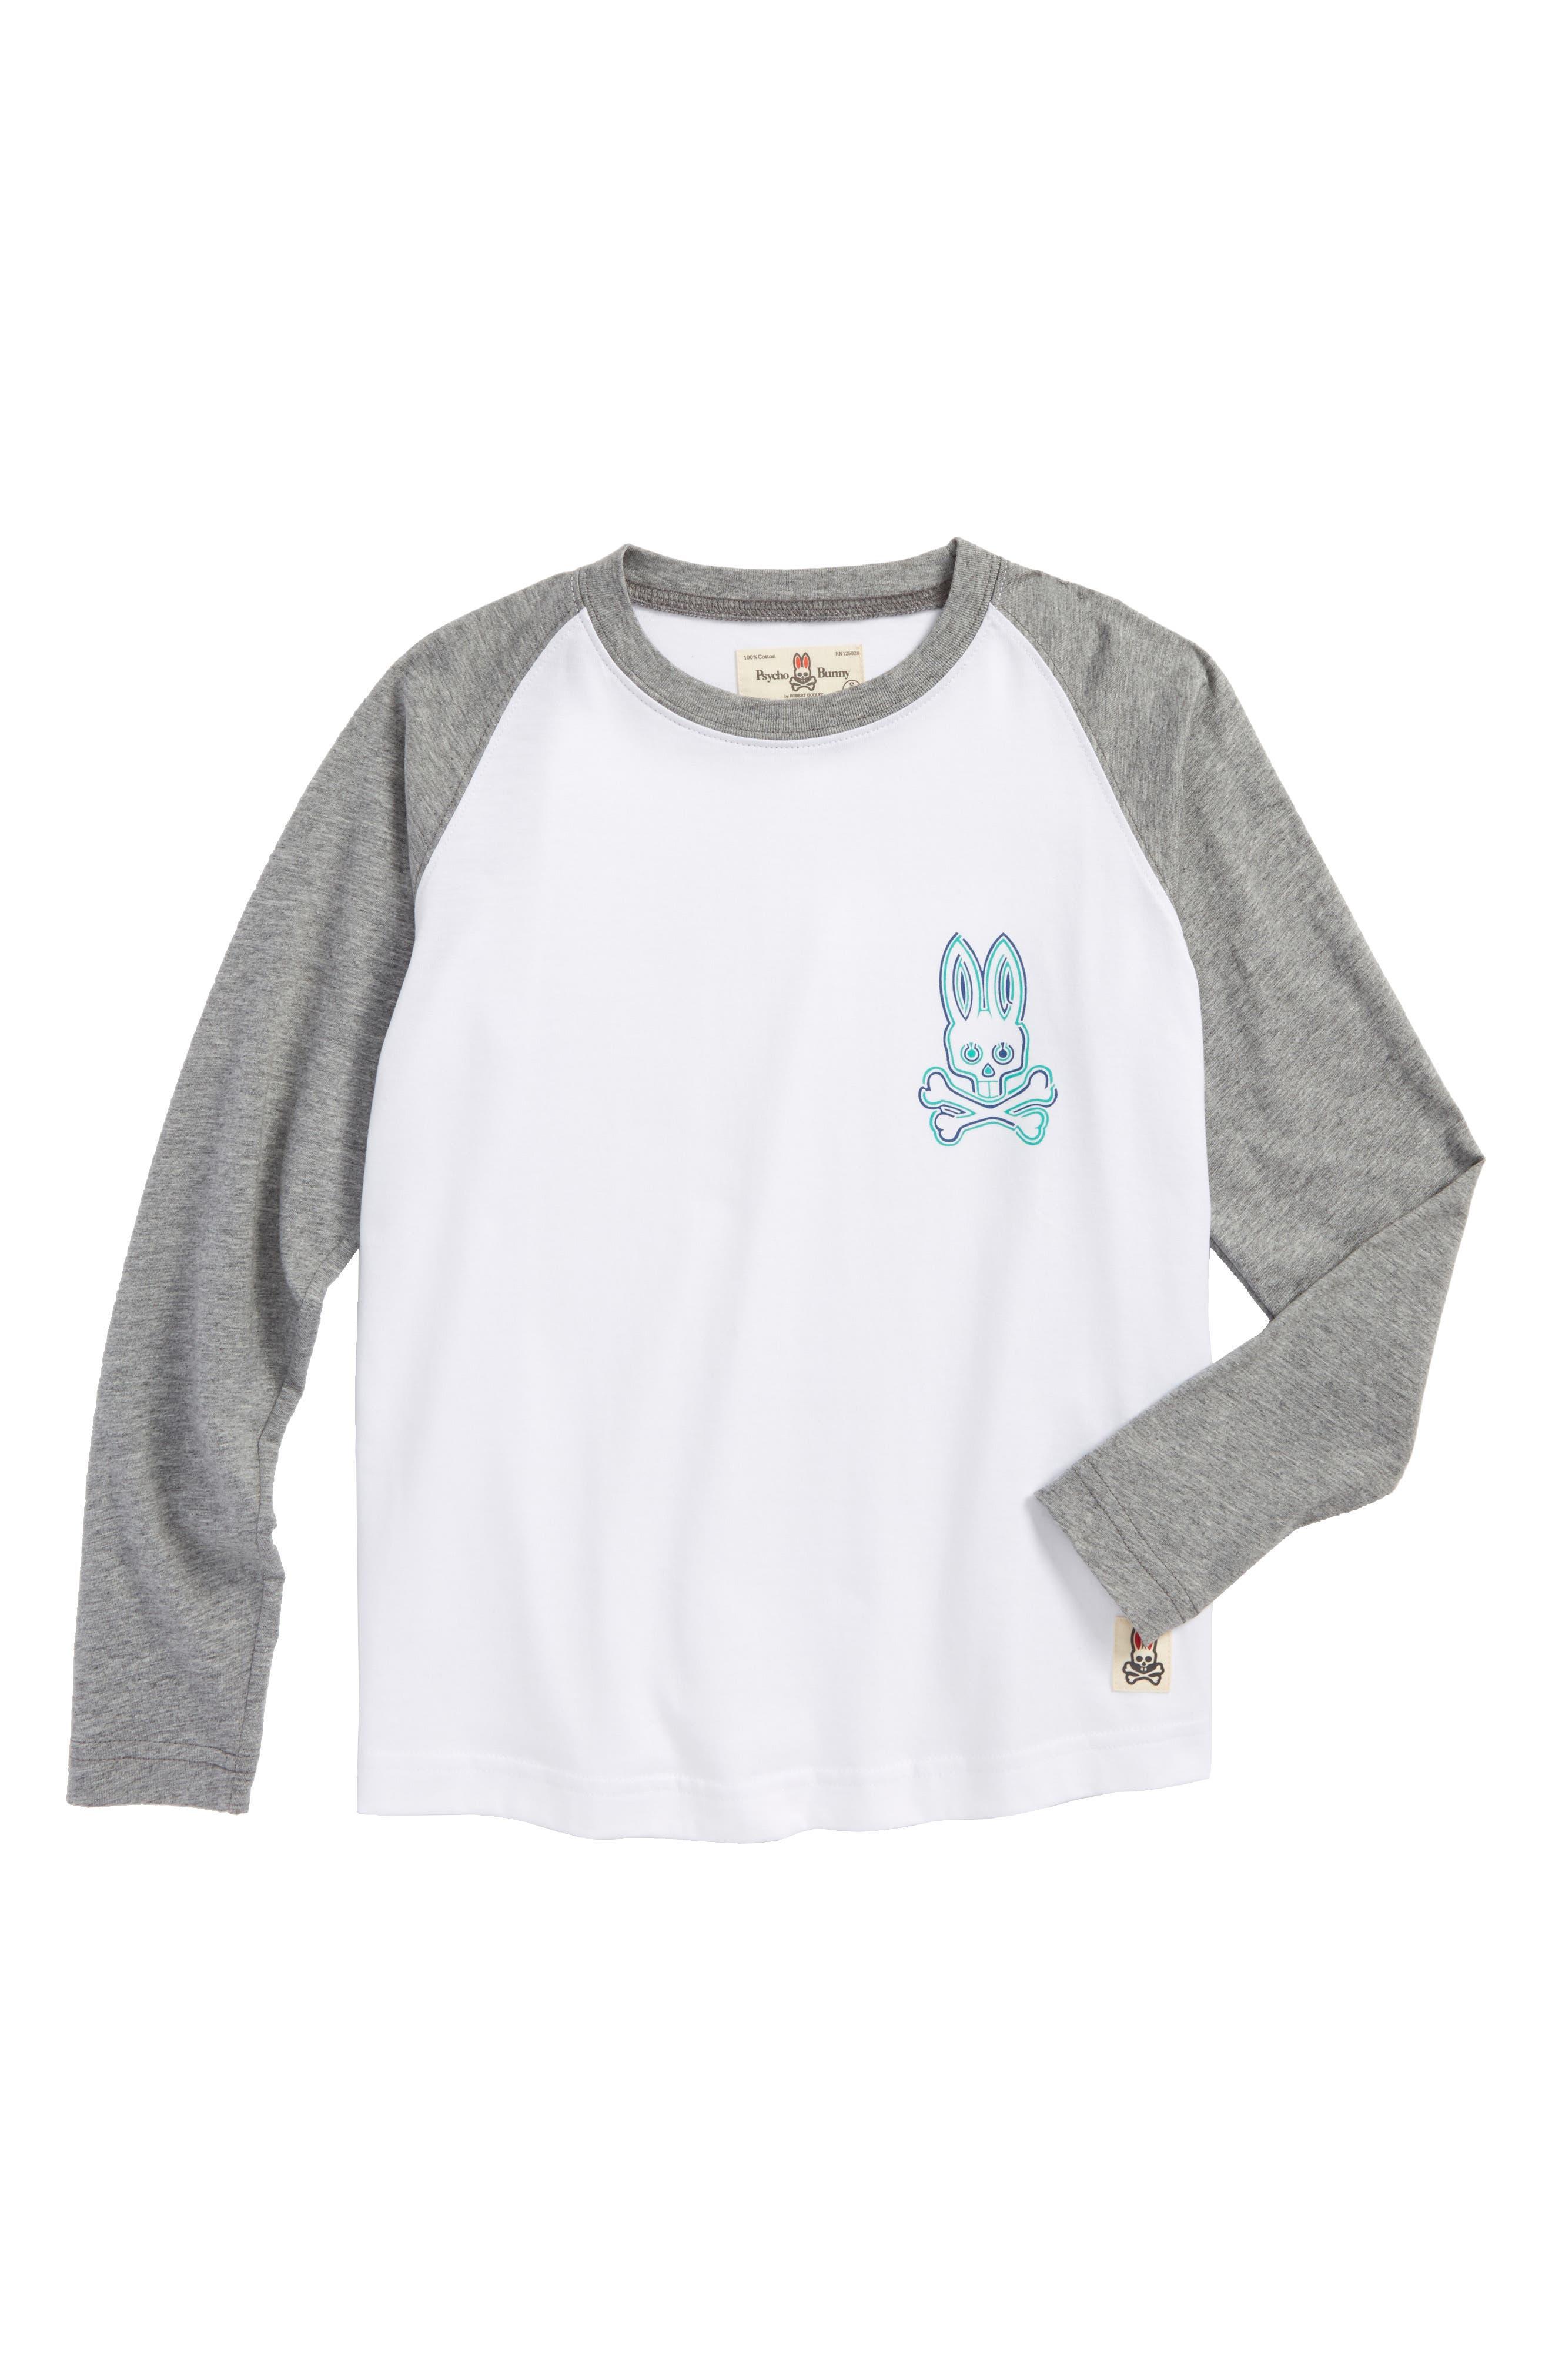 Main Image - Psycho Bunny Mantle Pima Cotton T-Shirt (Little Boys & Big Boys)